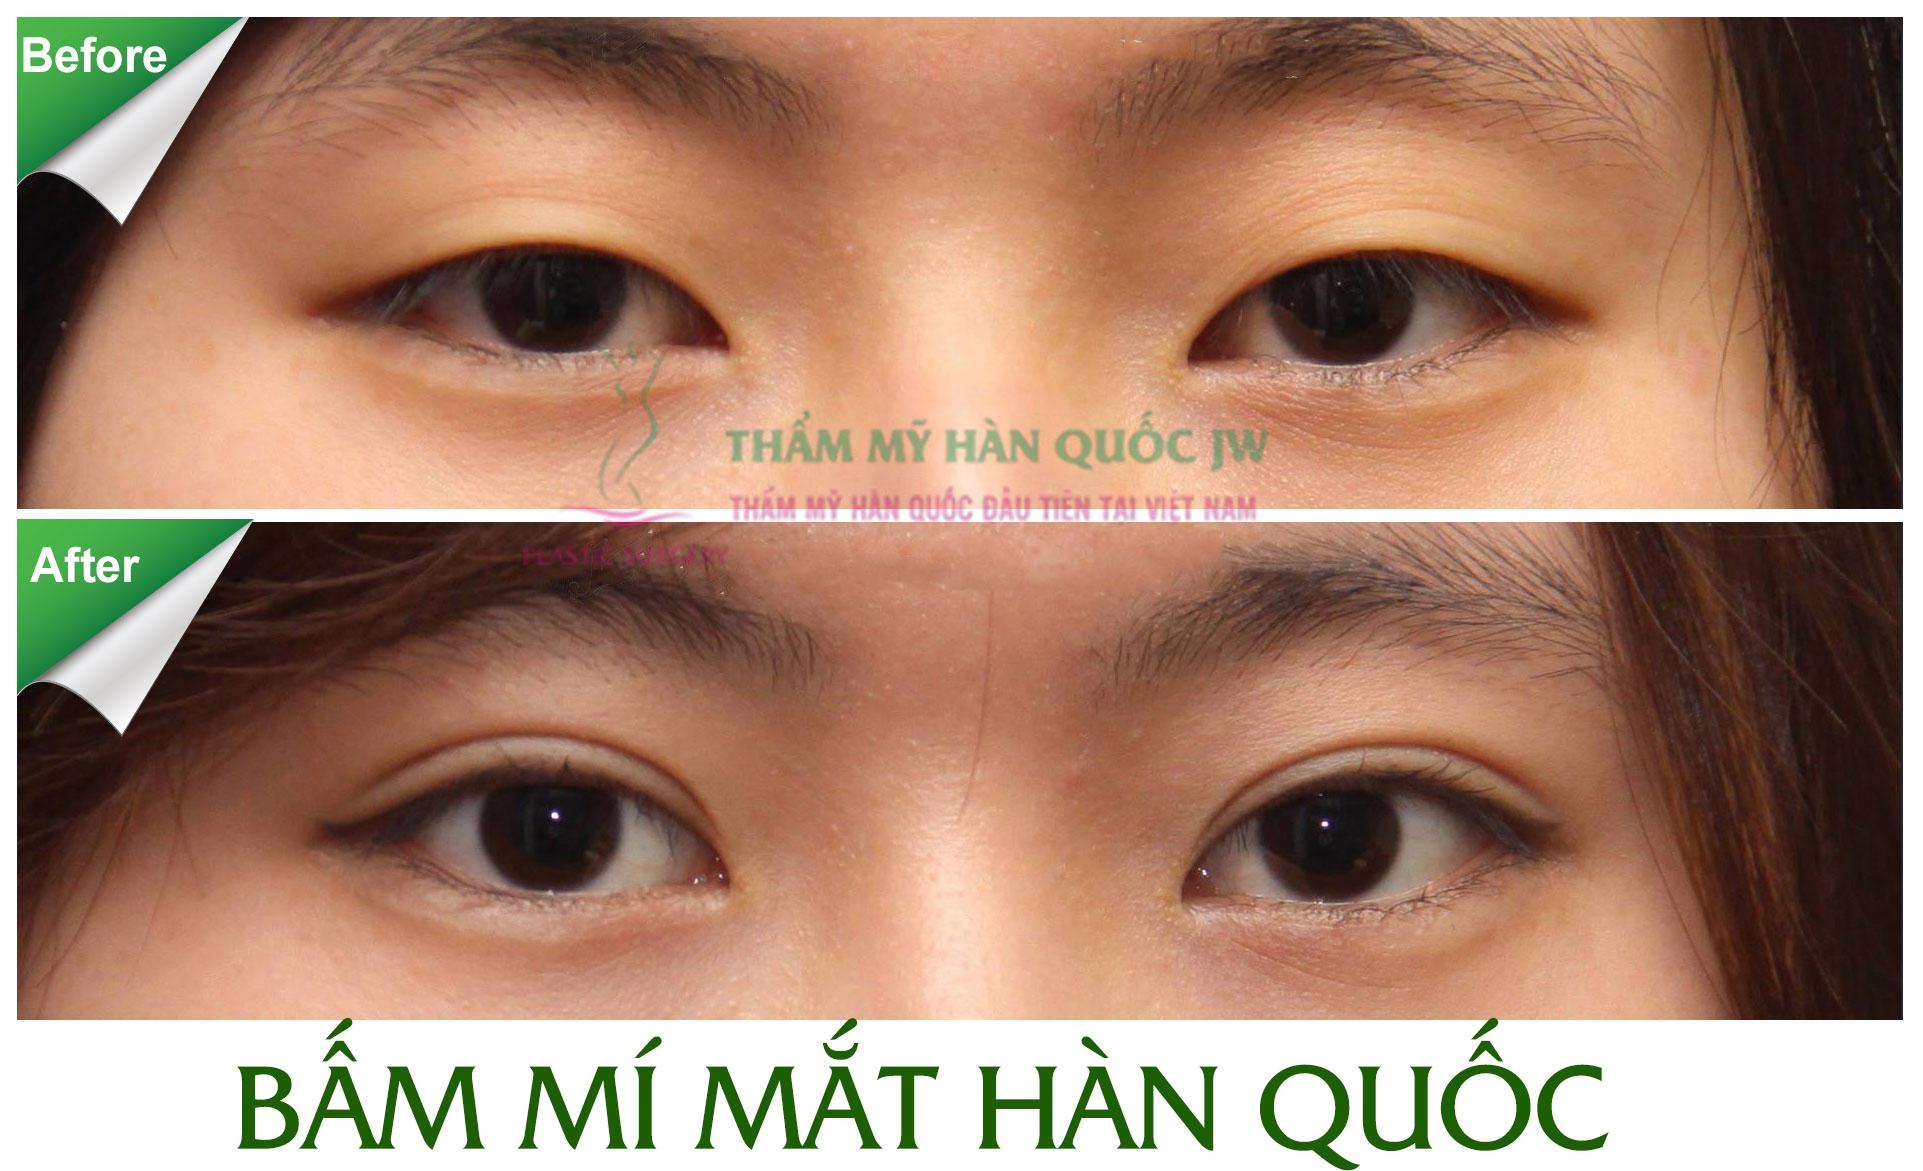 Tai sao nen chon dich vu bam mi Han Quoc de lam dep doi mat